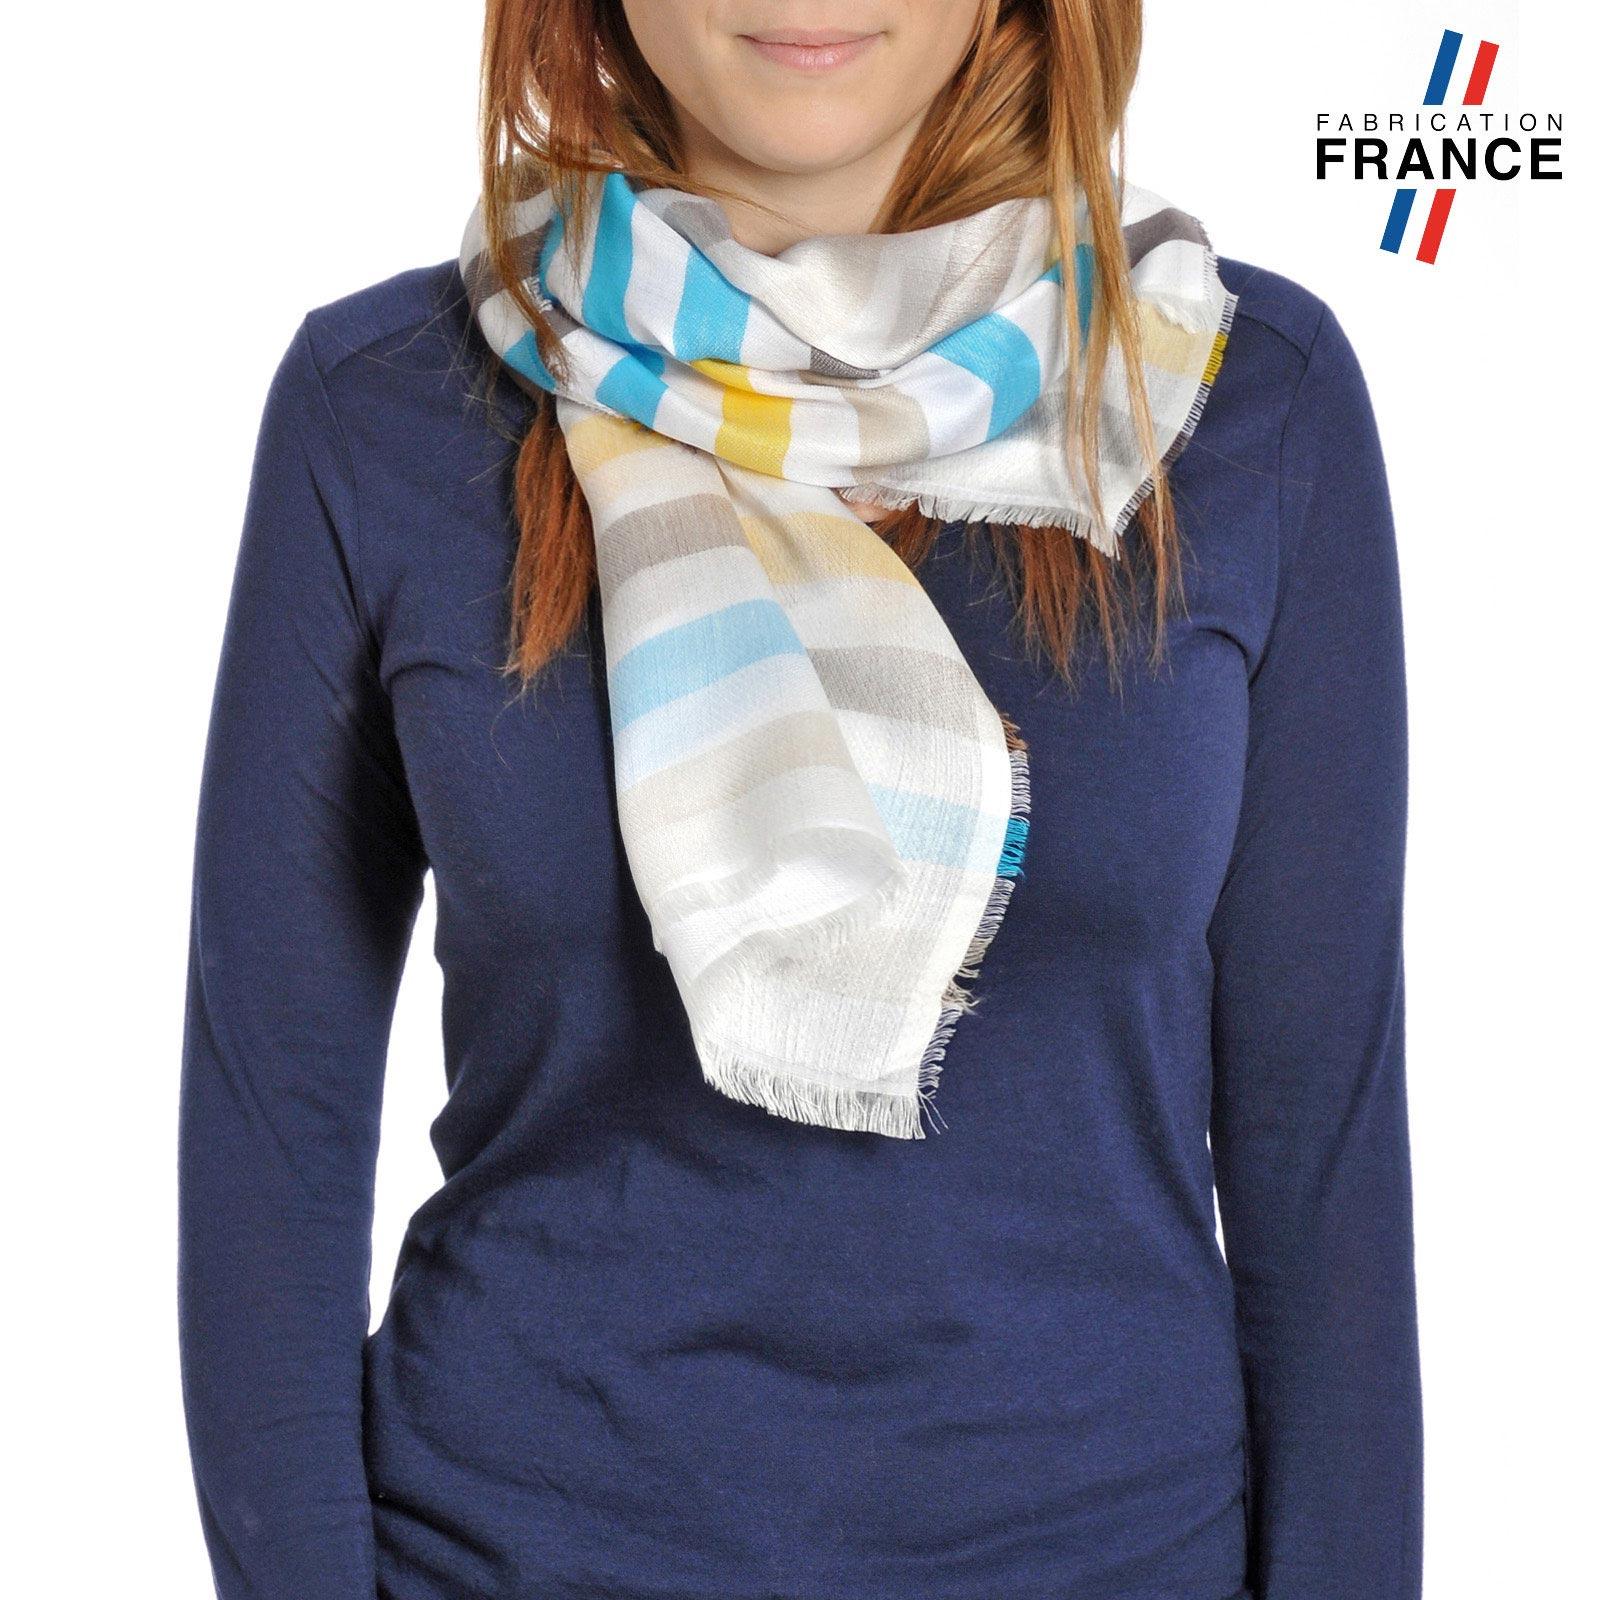 AT-04293-VF10-LB_FR-echarpe-rayures-bleu-taupe-qualicoq